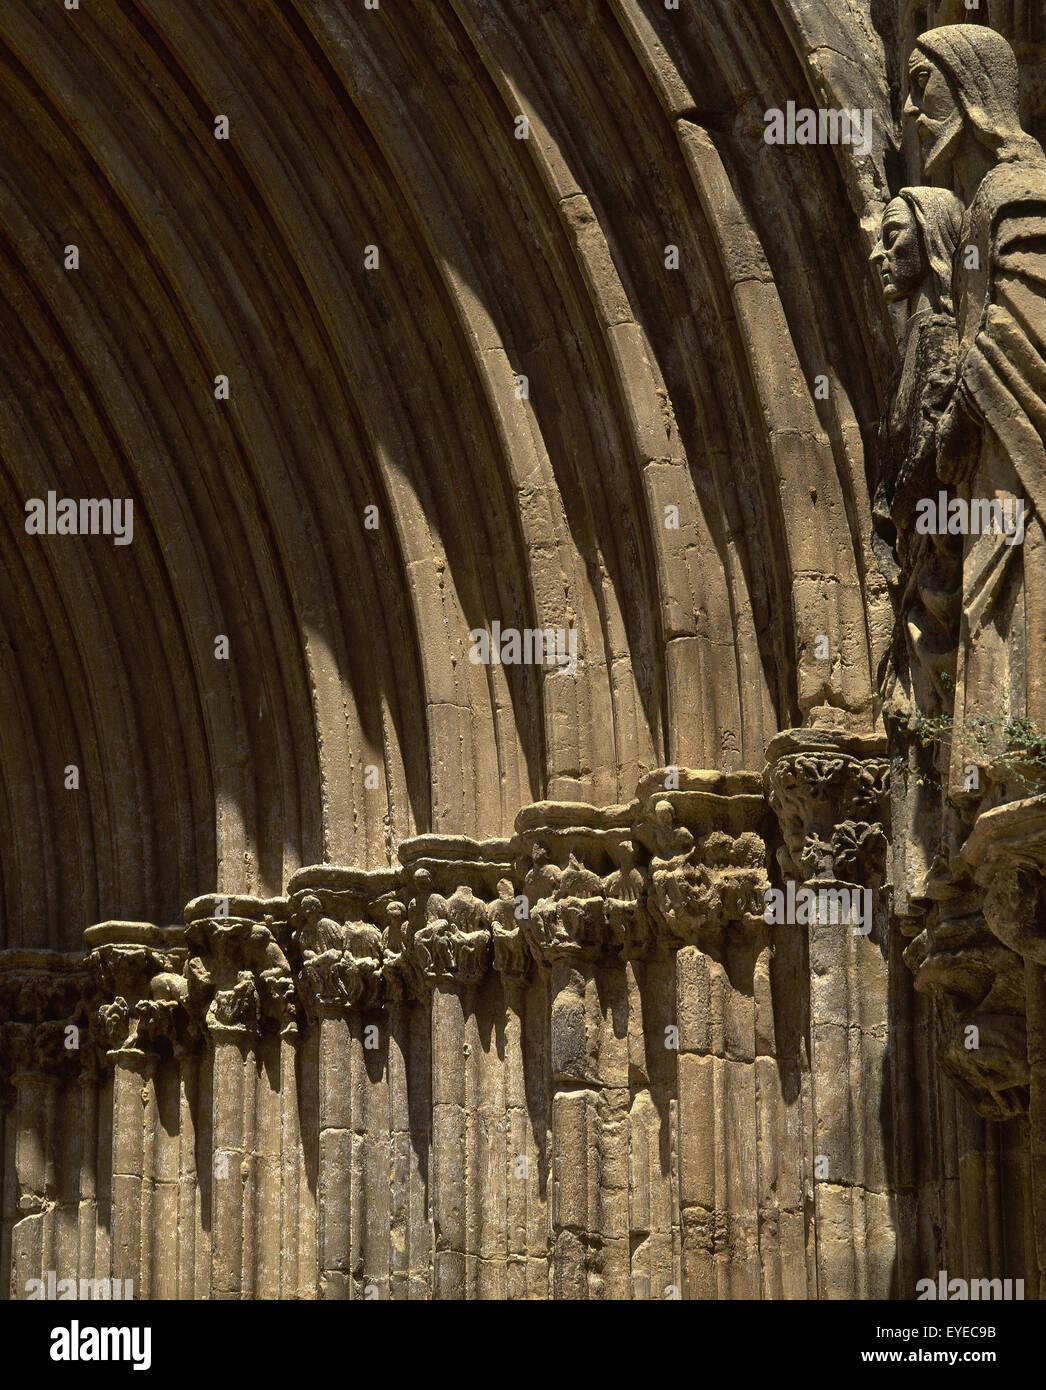 Gothic art. Spain. Aragon. Valderrobres. Church of Santa Maria la Mayor. 14th century. Archivolt. - Stock Image